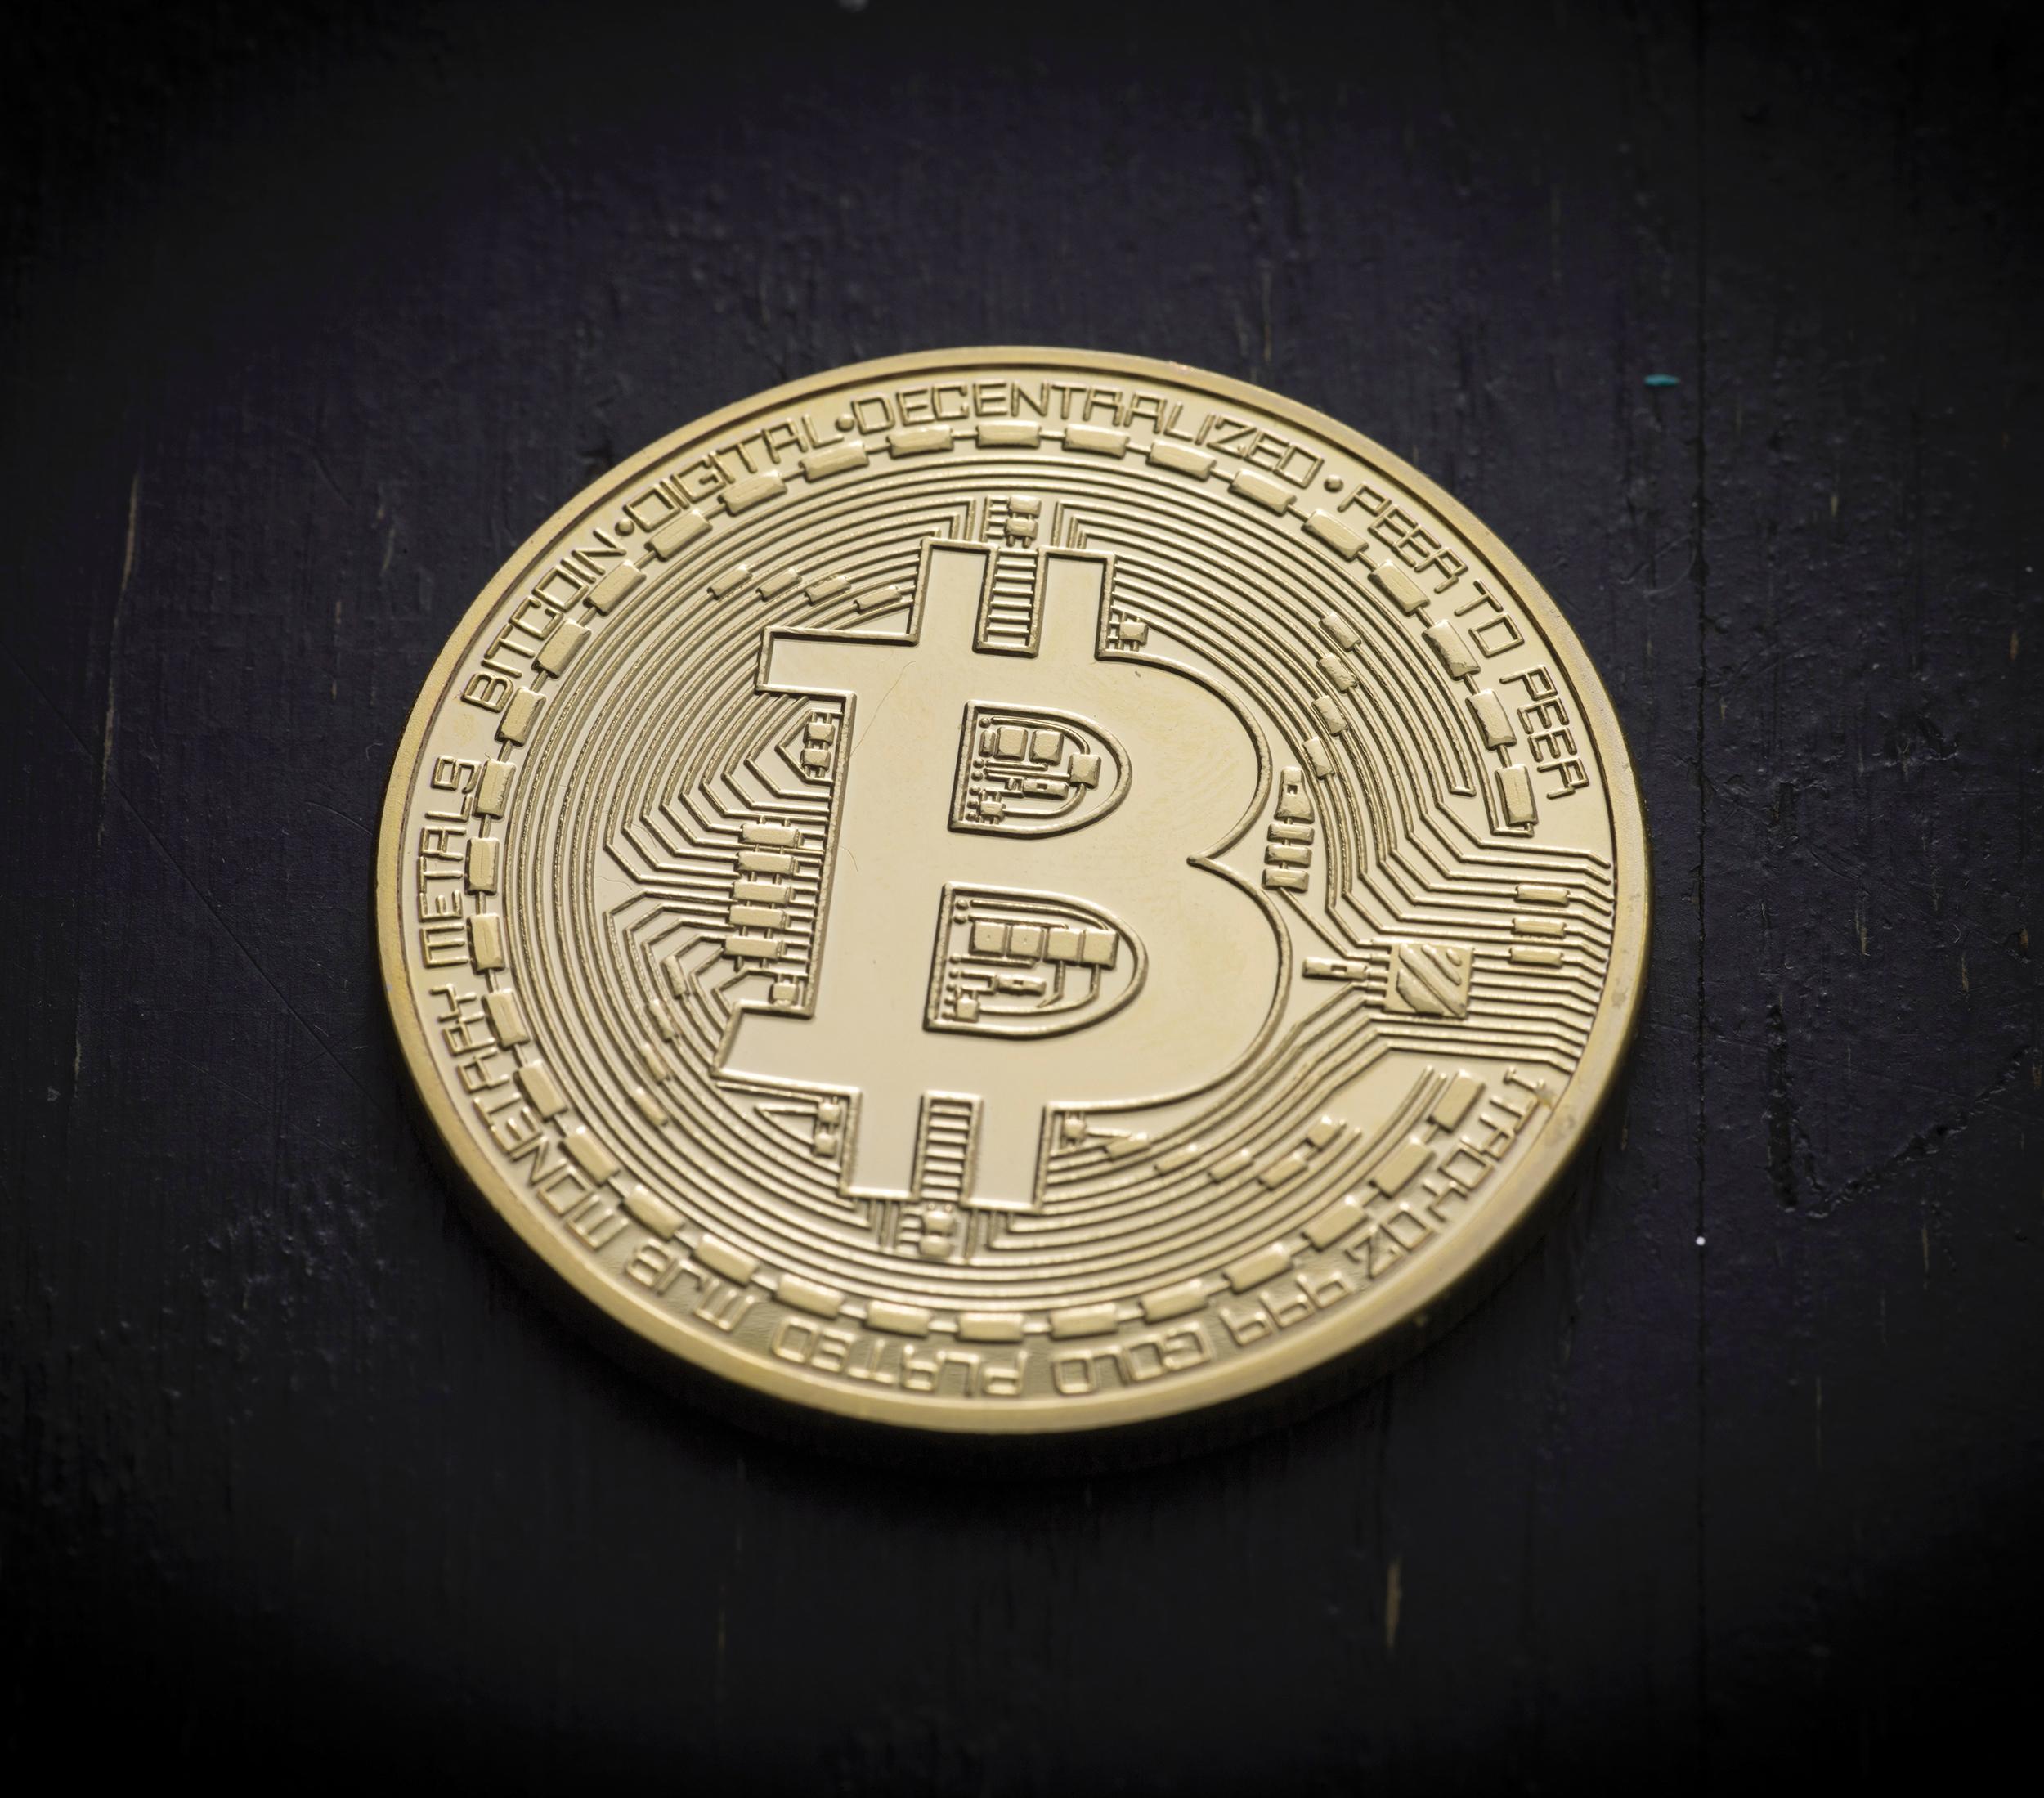 câți dolari în bitcoin